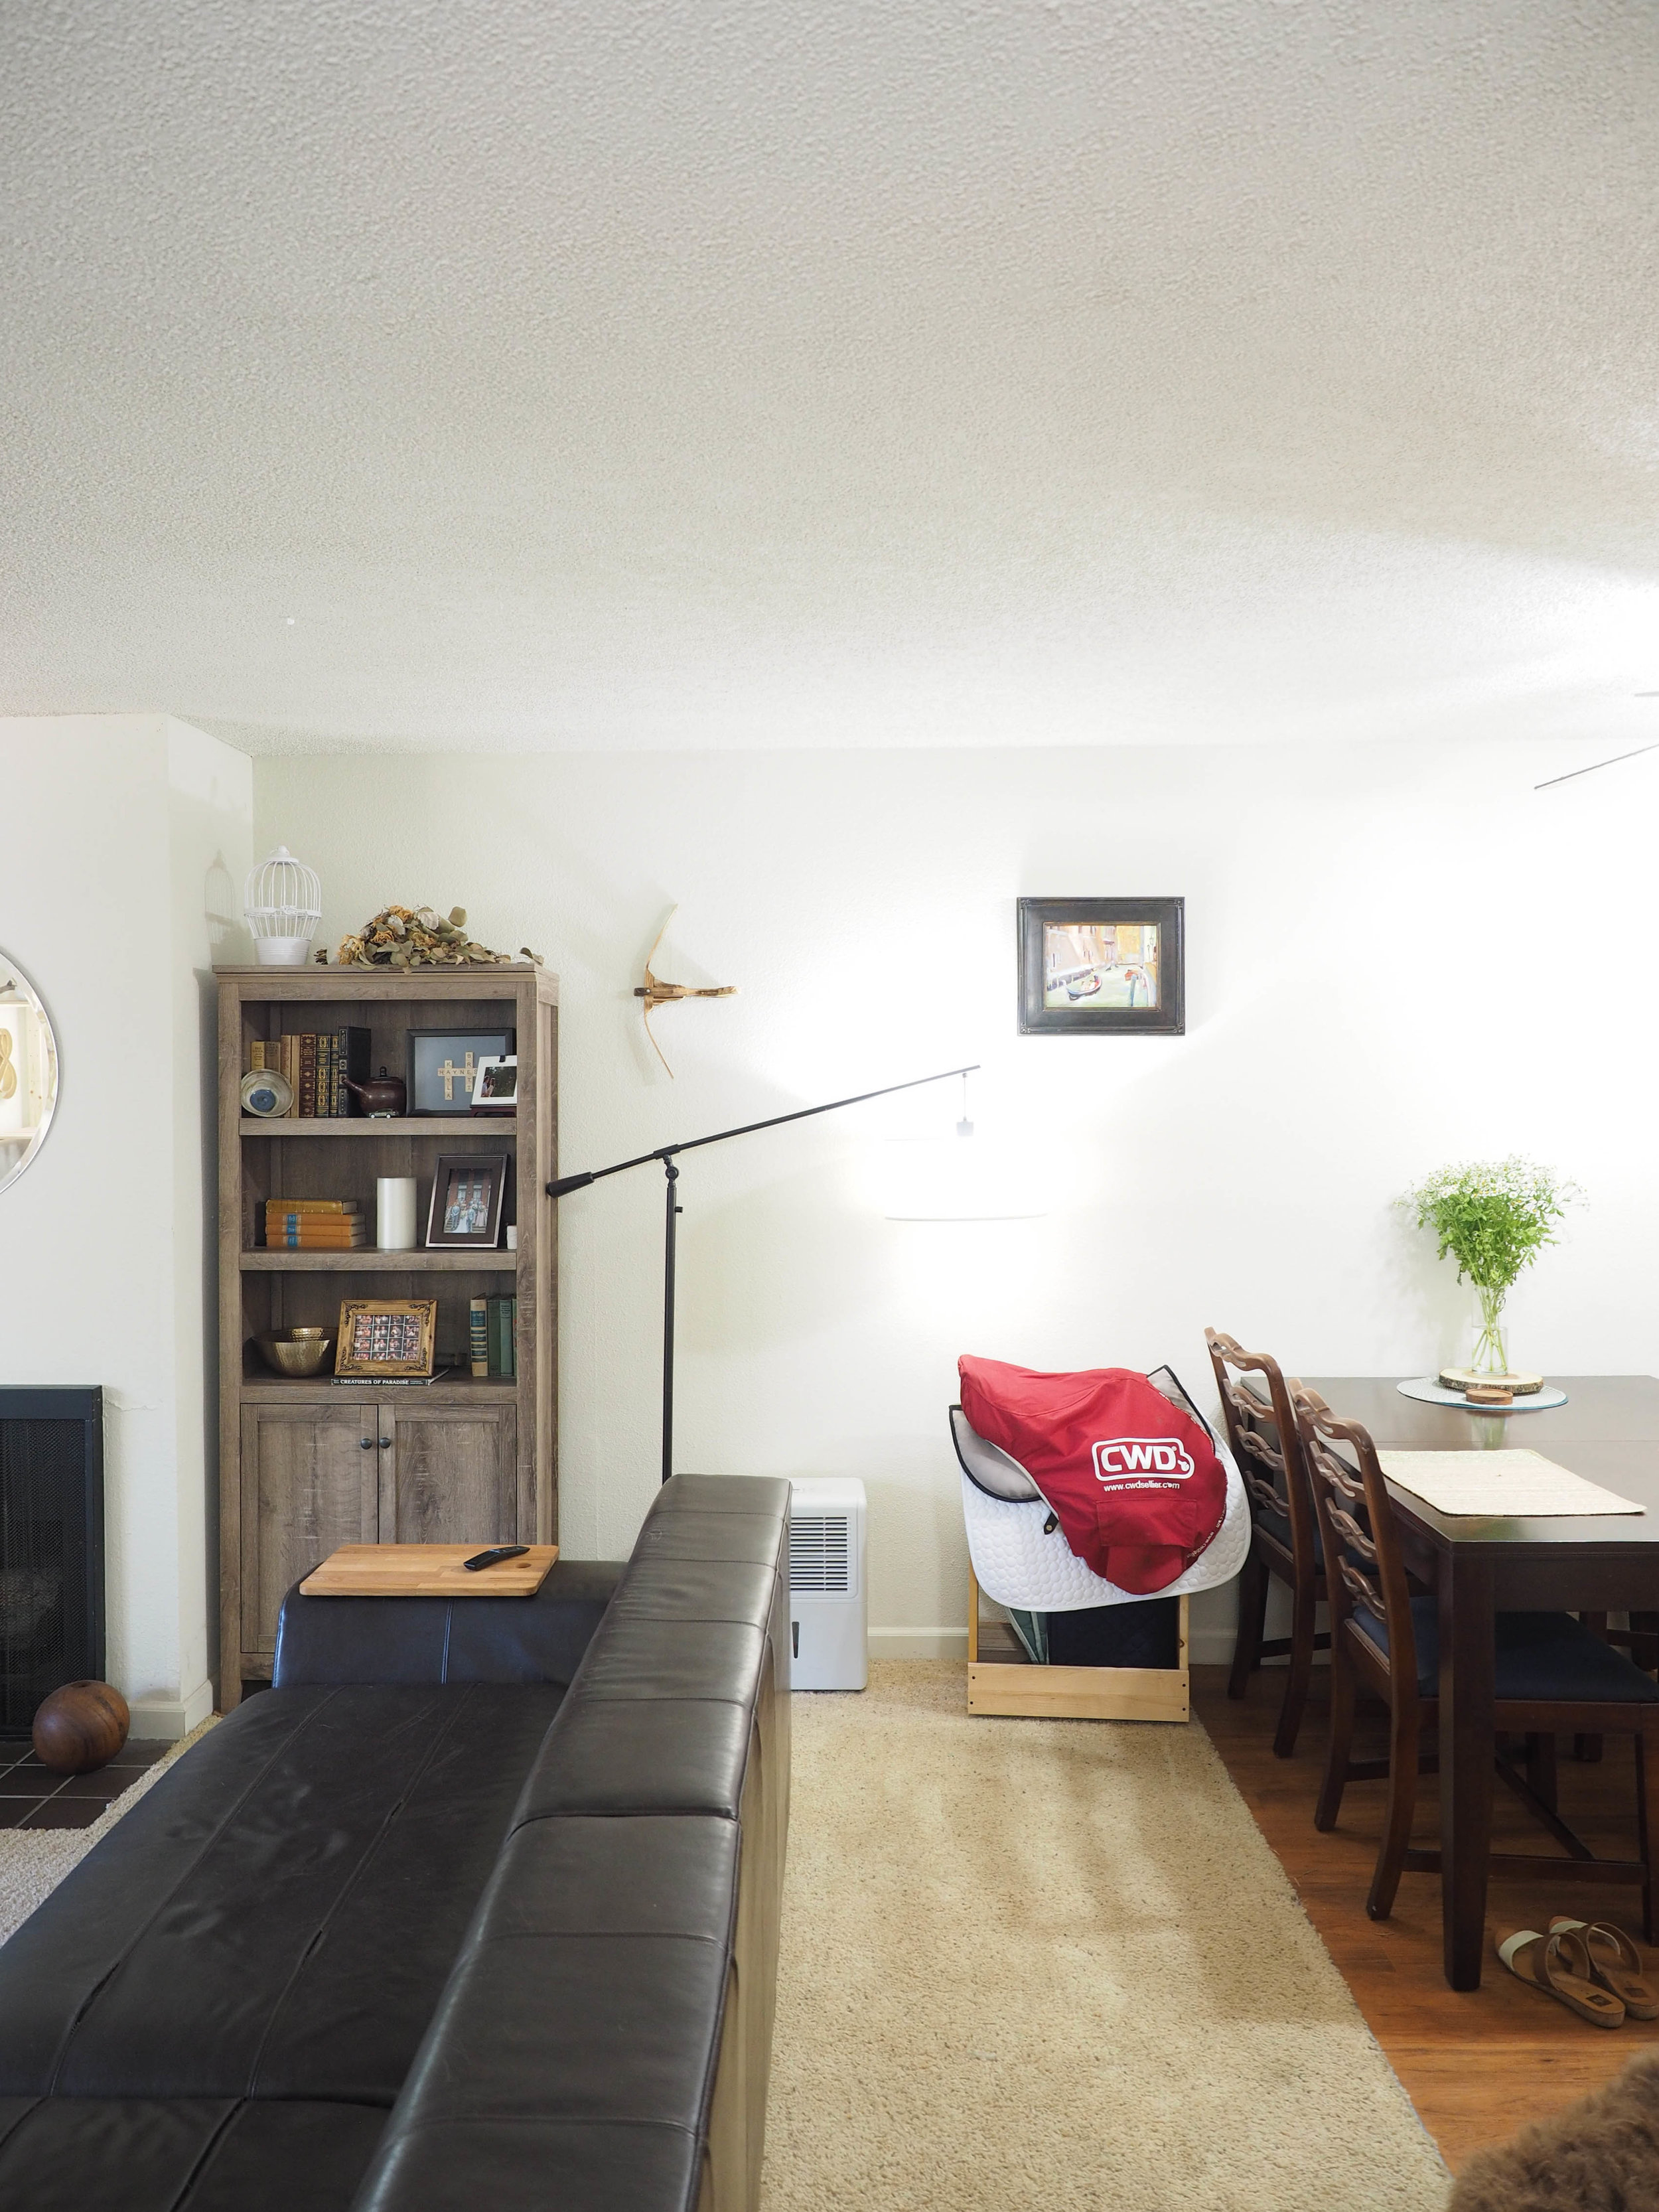 apartment-tour-twoh-15.jpg